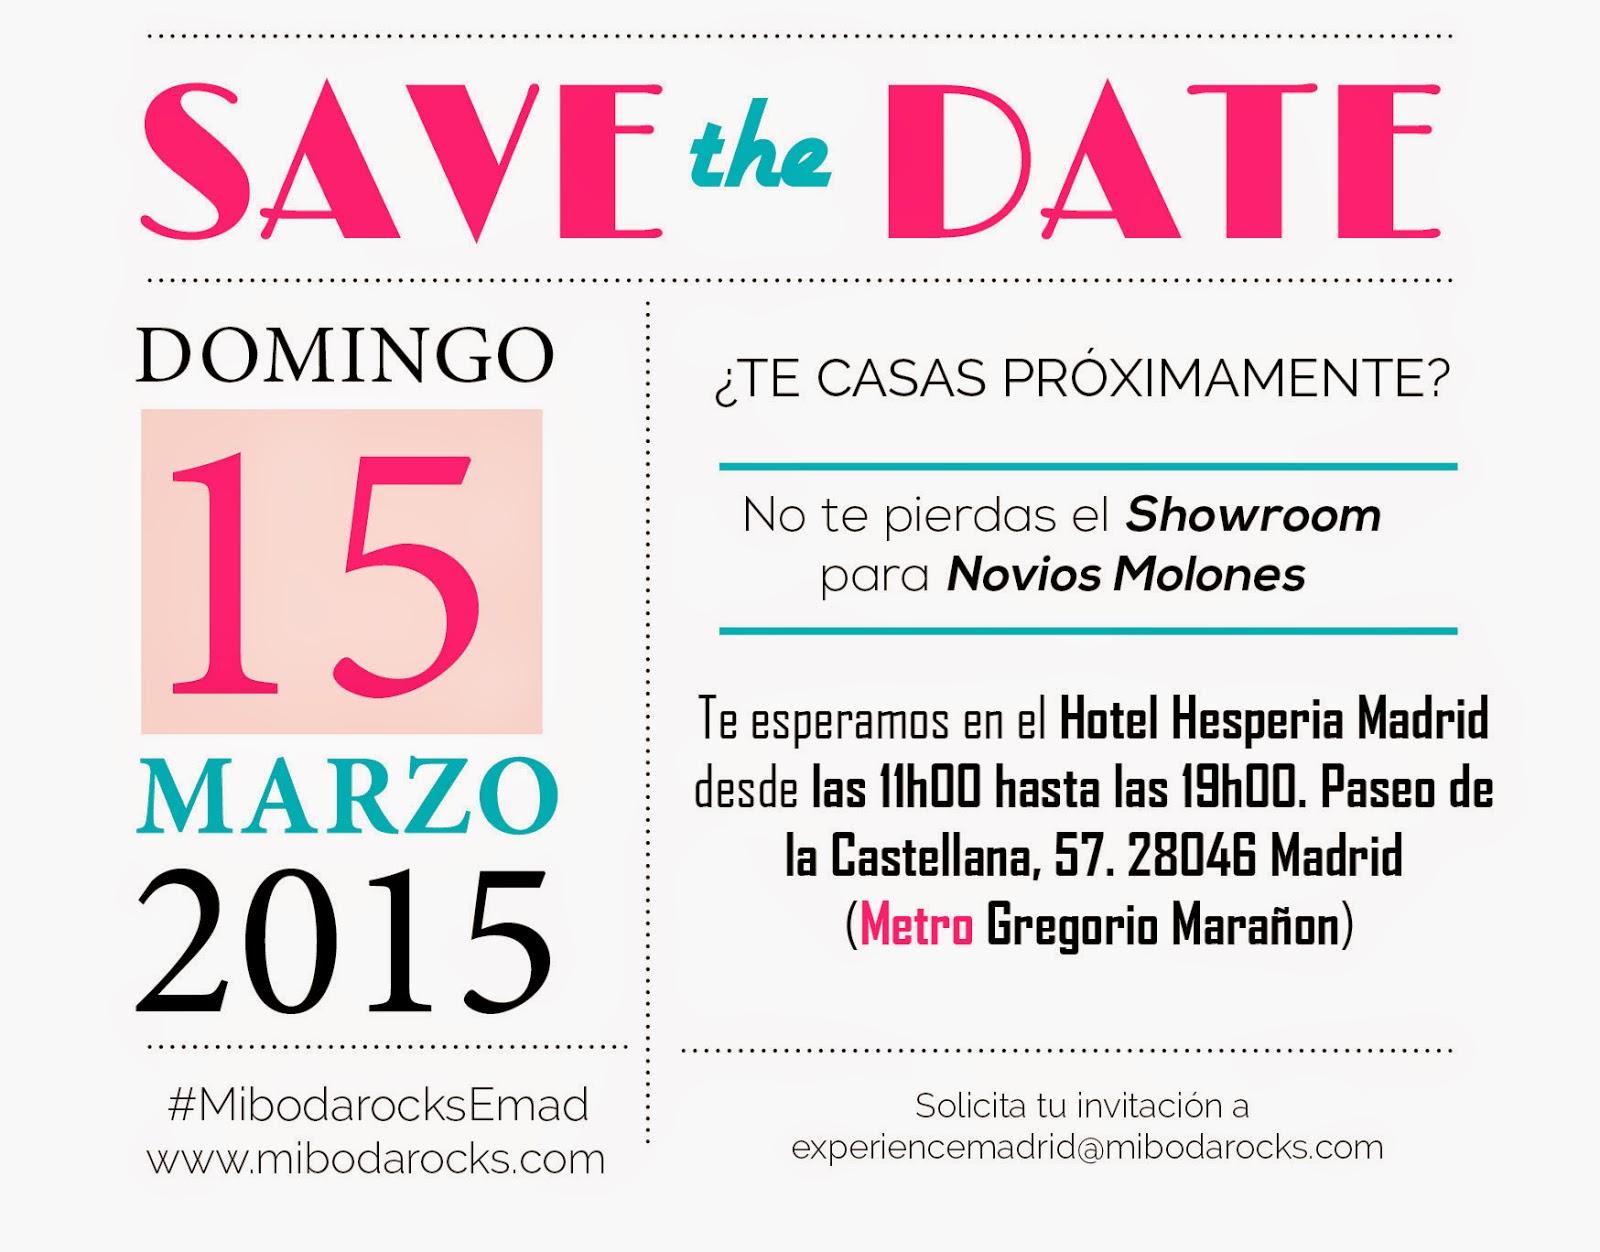 hotel hesperia 5* mi boda rocks experience madrid 15 de marzo 2015